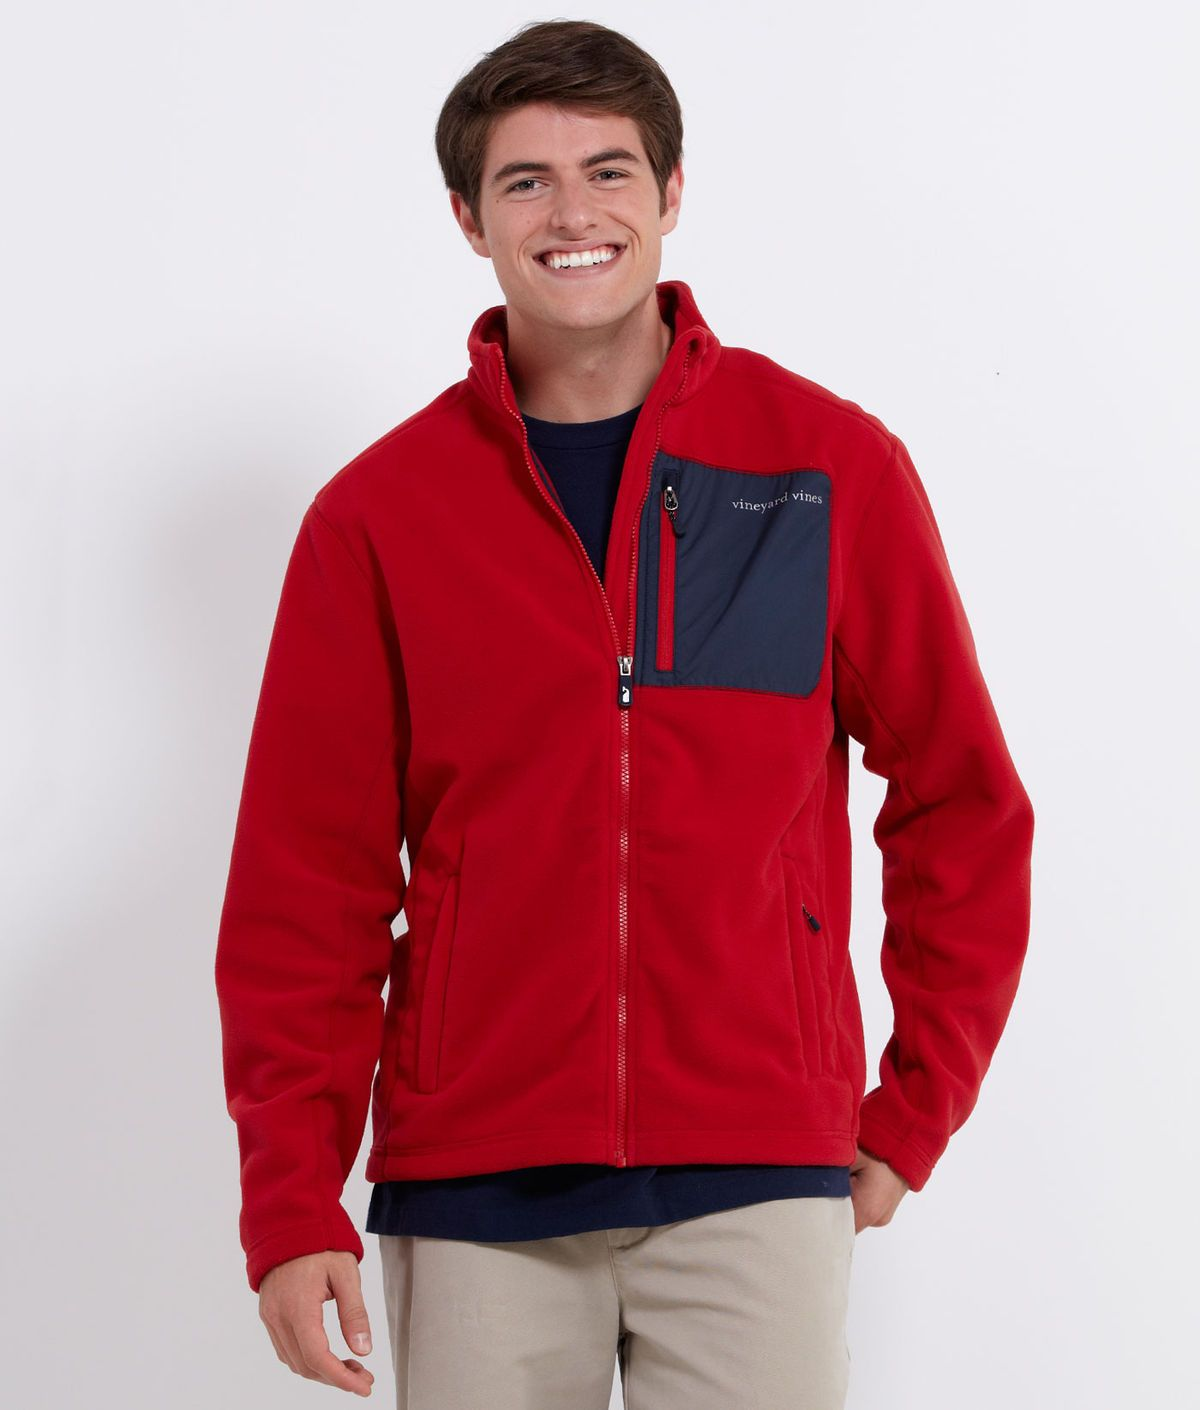 Windpro jacket i need pinterest mens fleece jacket